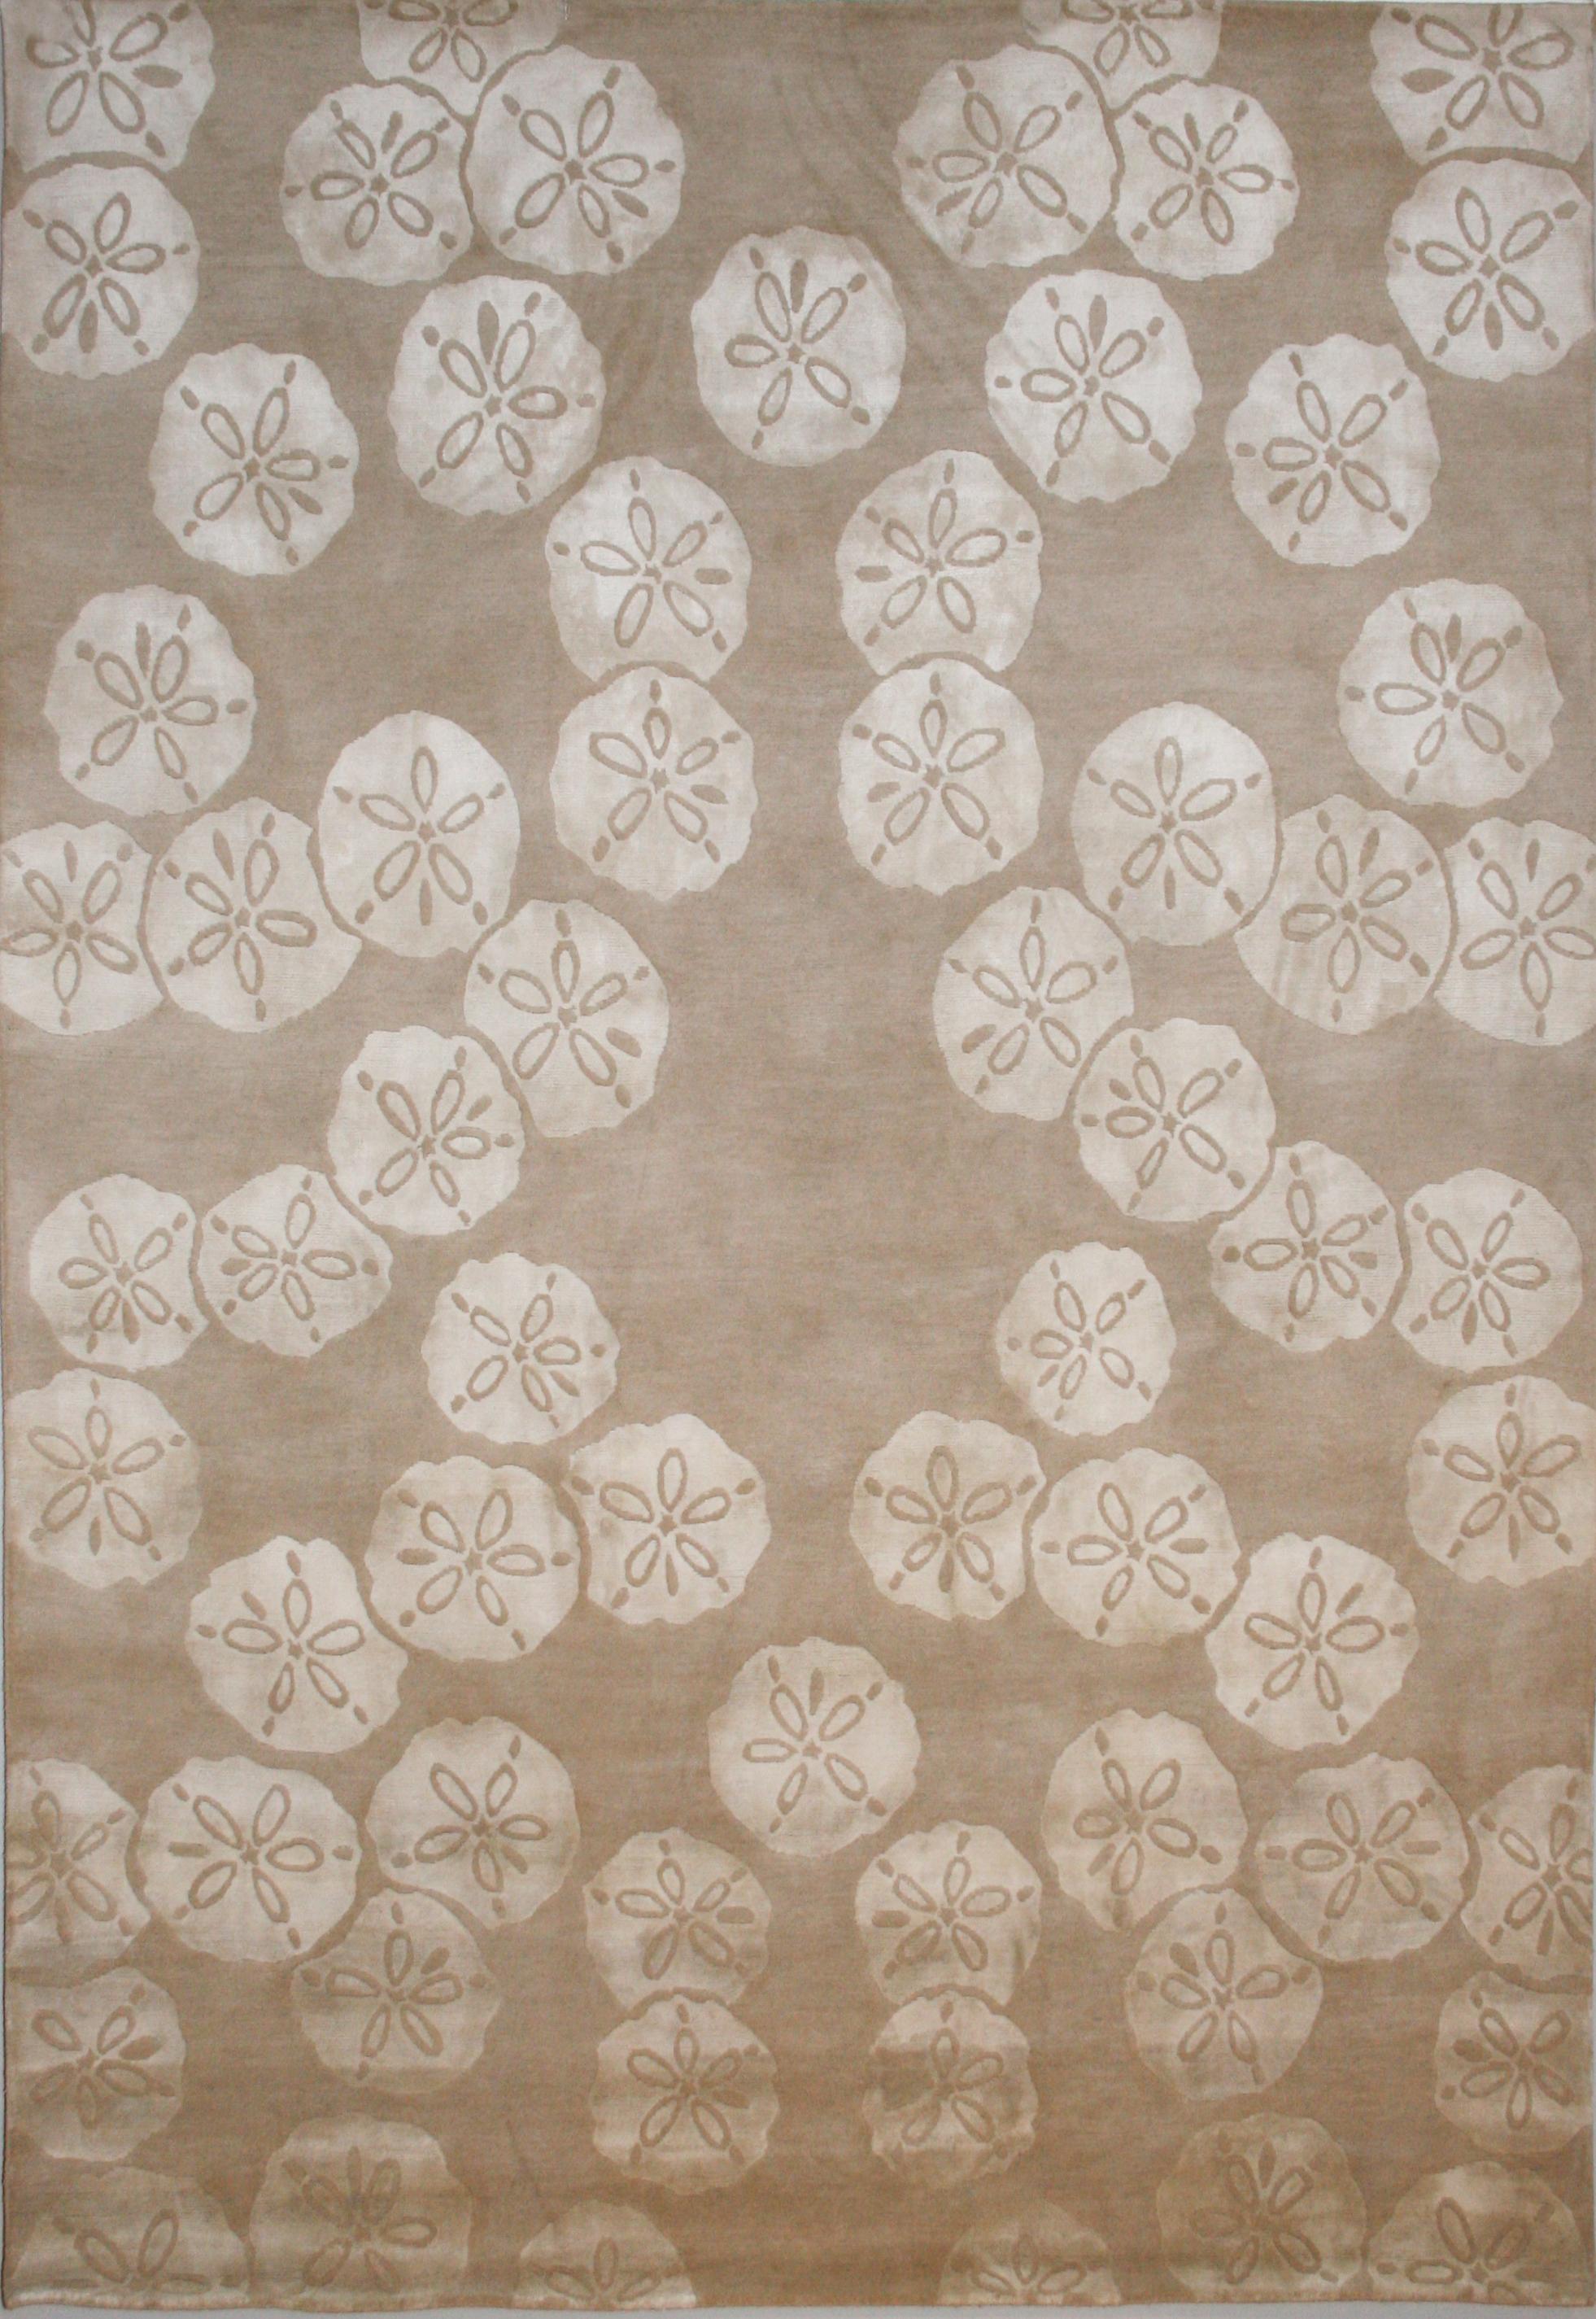 776 Sand Dollar, Wool and Silk, Nepal, 6'x9'